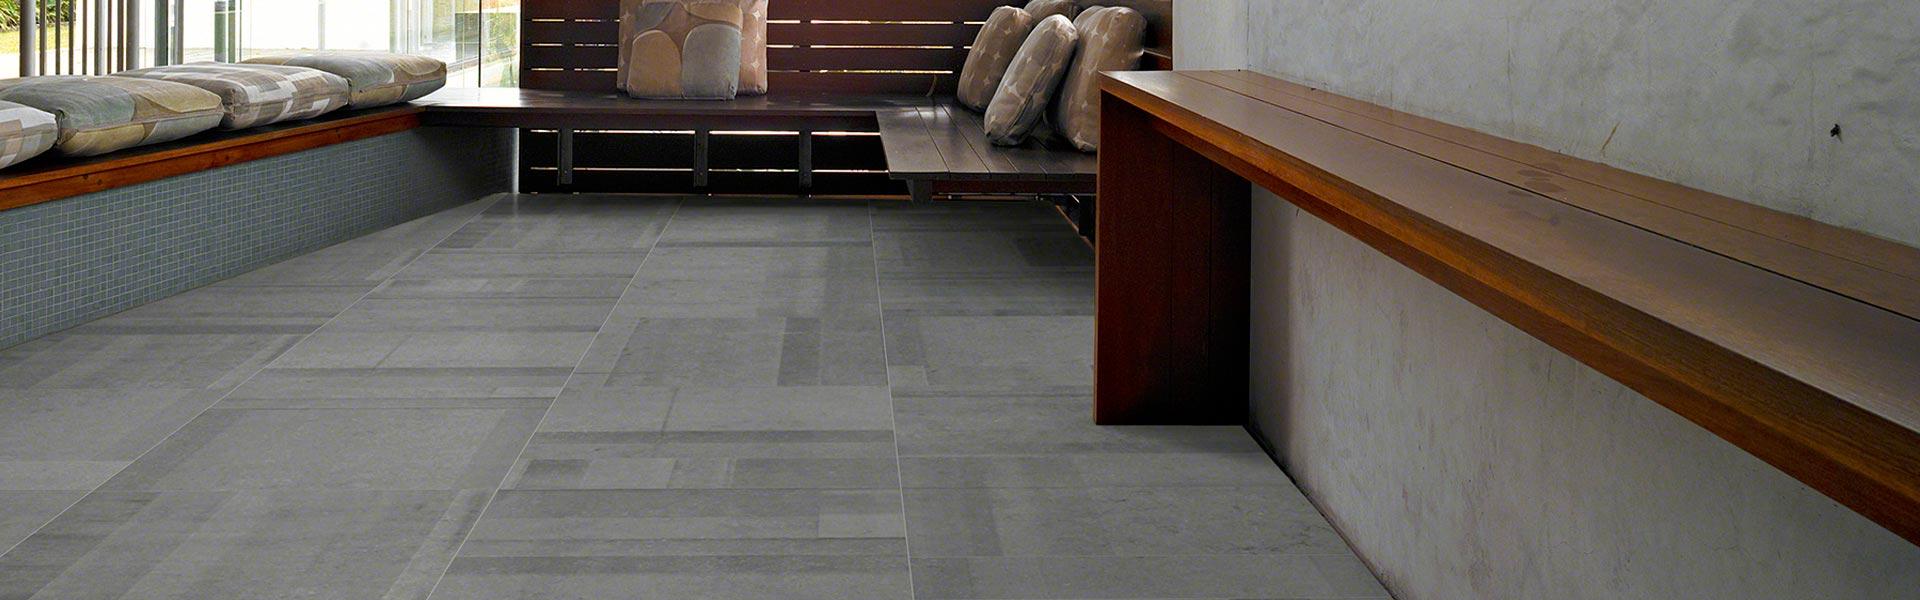 Vives floor tiles porcelain bluestone 593x593 bluestone porcelain floor tiles by vives azulejos y gres sa dailygadgetfo Images